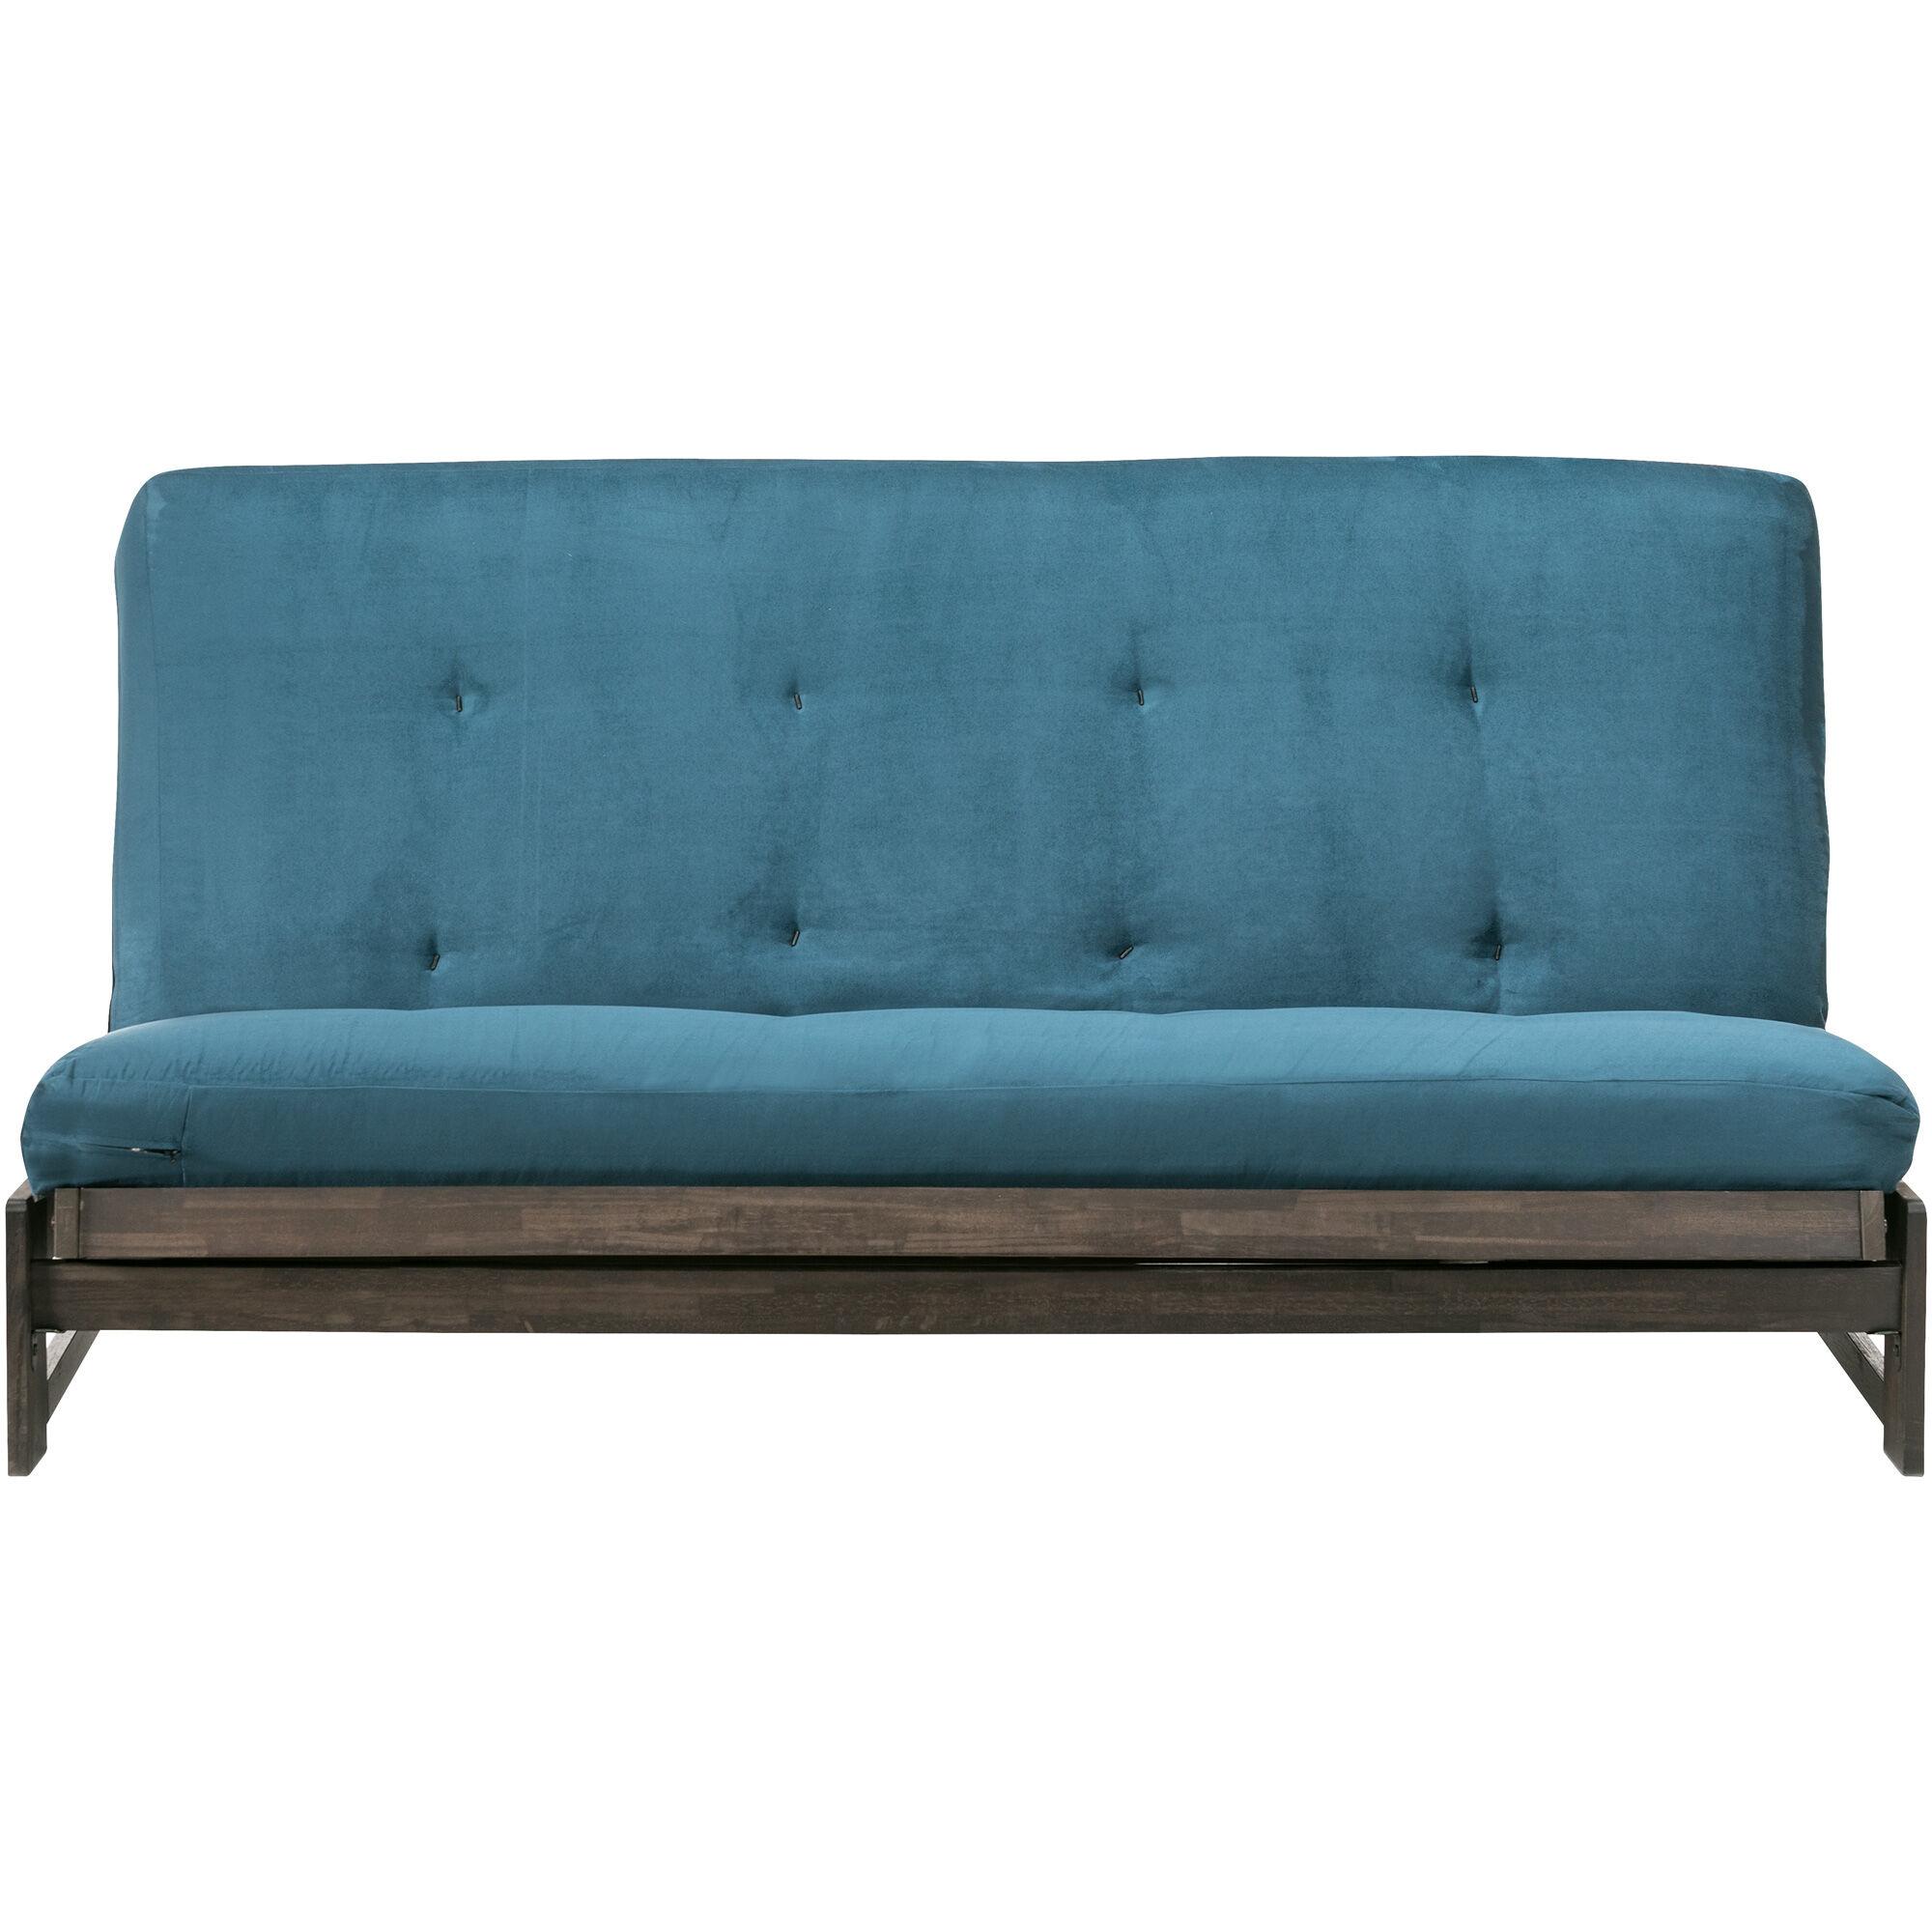 Slumberland Furniture Aspen Espresso Armless Futon Frame